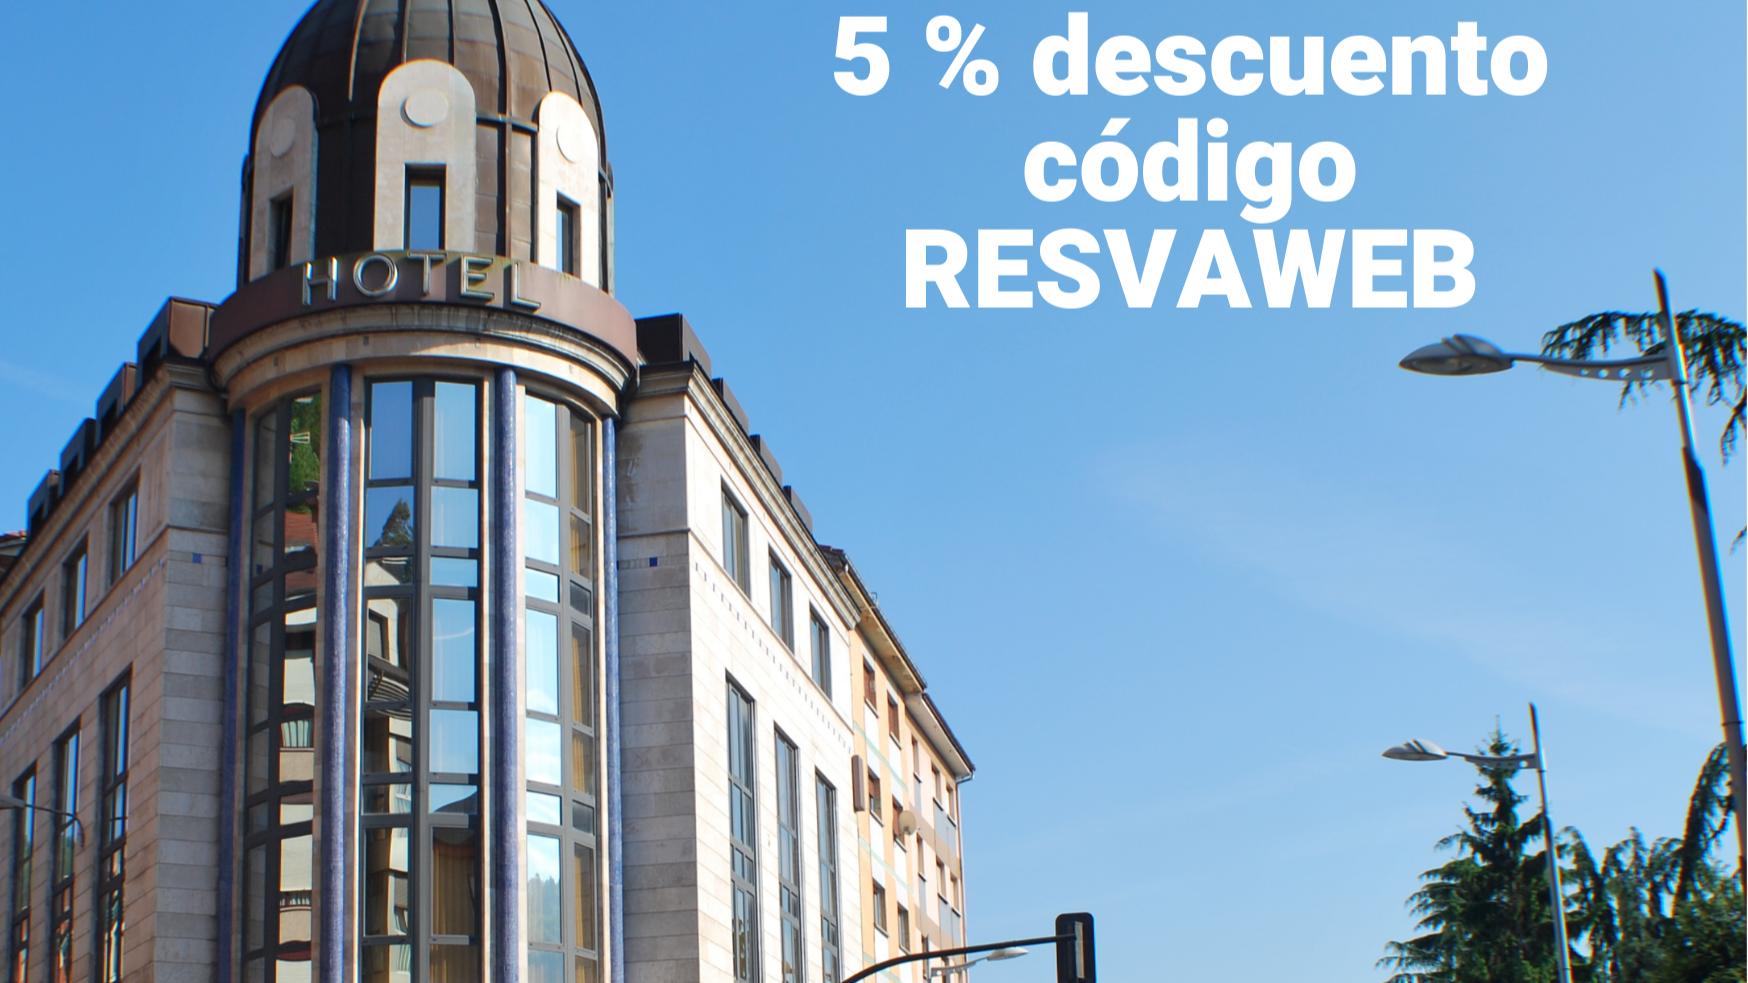 RESERVA WEB - 5 %